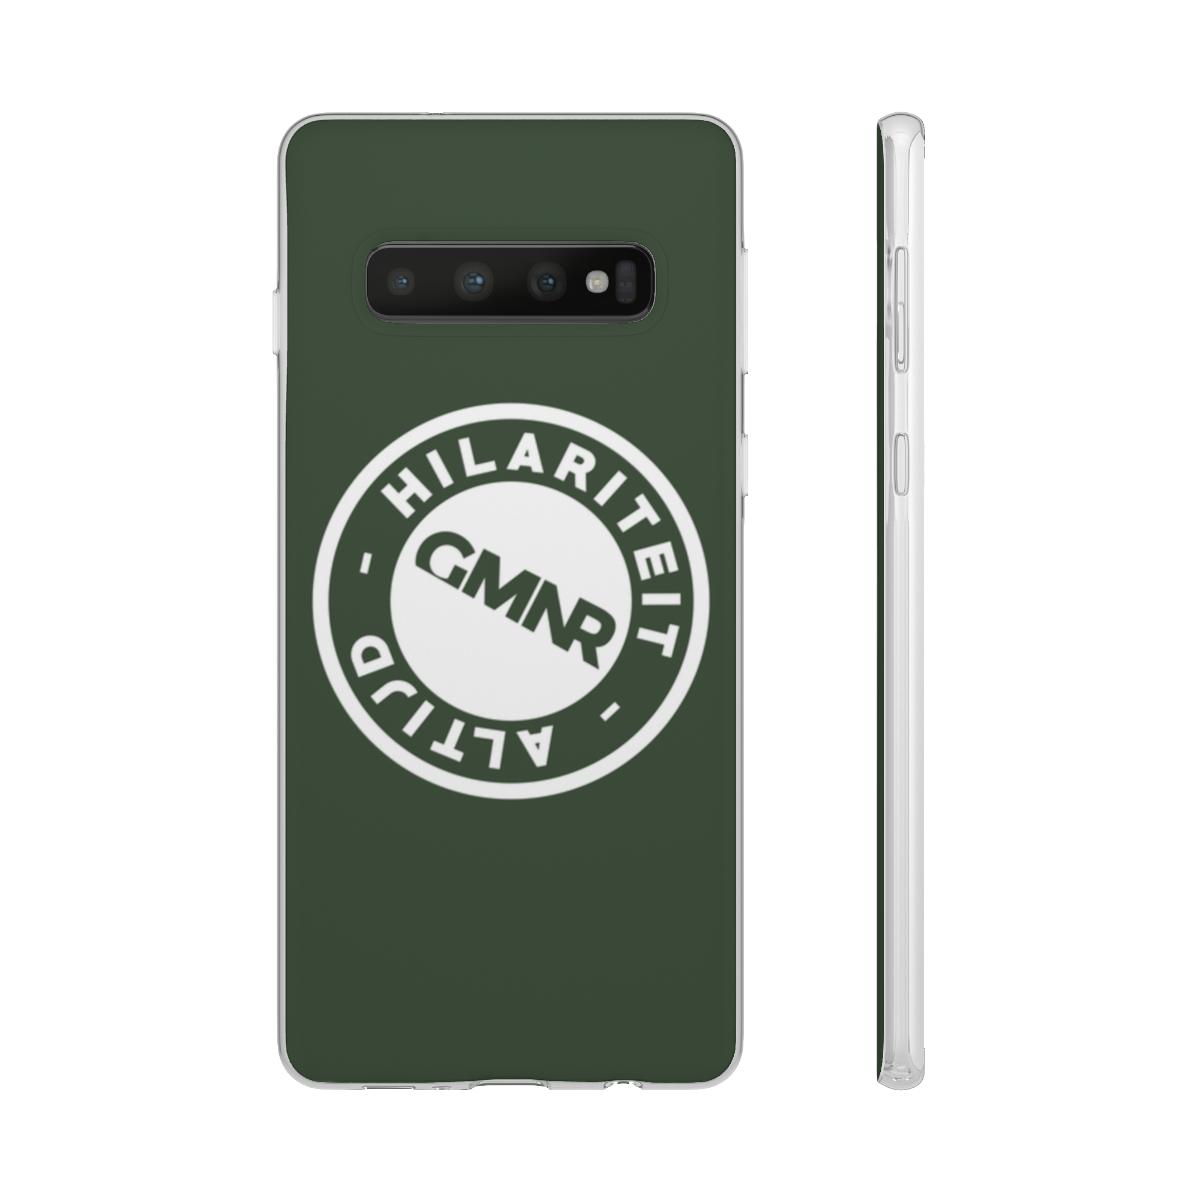 GMNR Stempel Phone Case